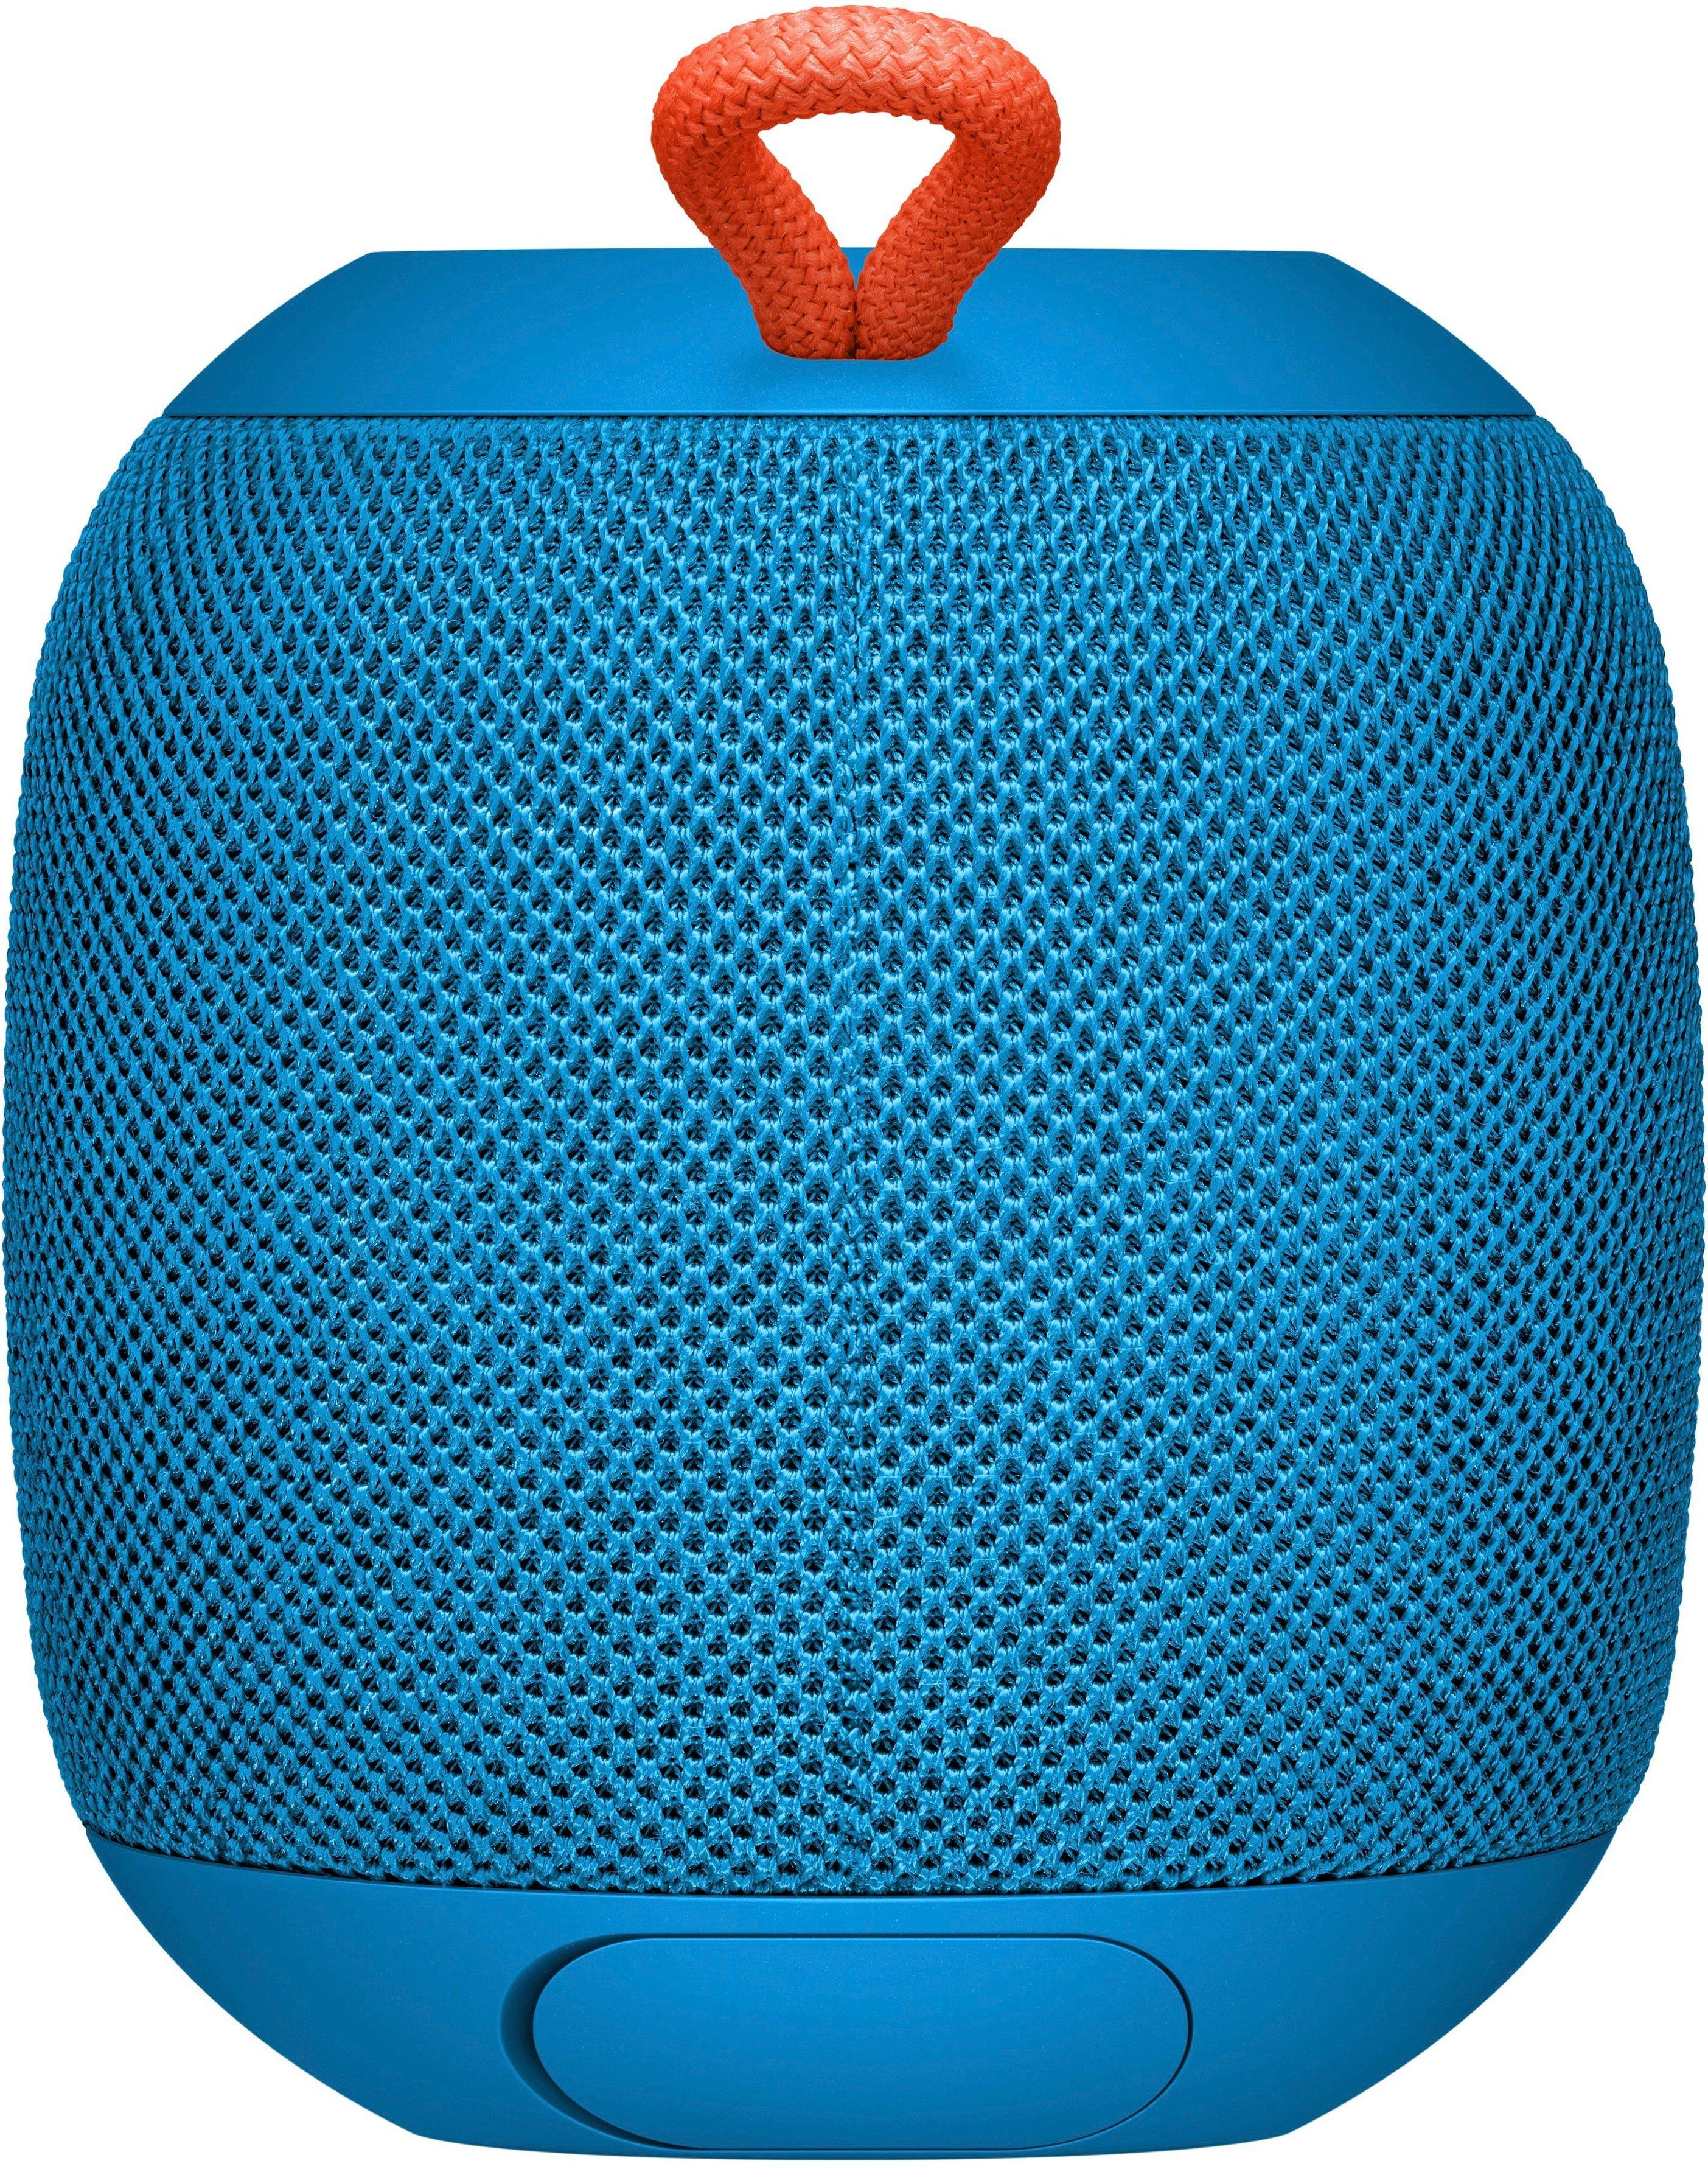 Ultimate Ears WONDERBOOM Portable Bluetooth Speaker Subzero Blue 984-000840 - Best Buy $50